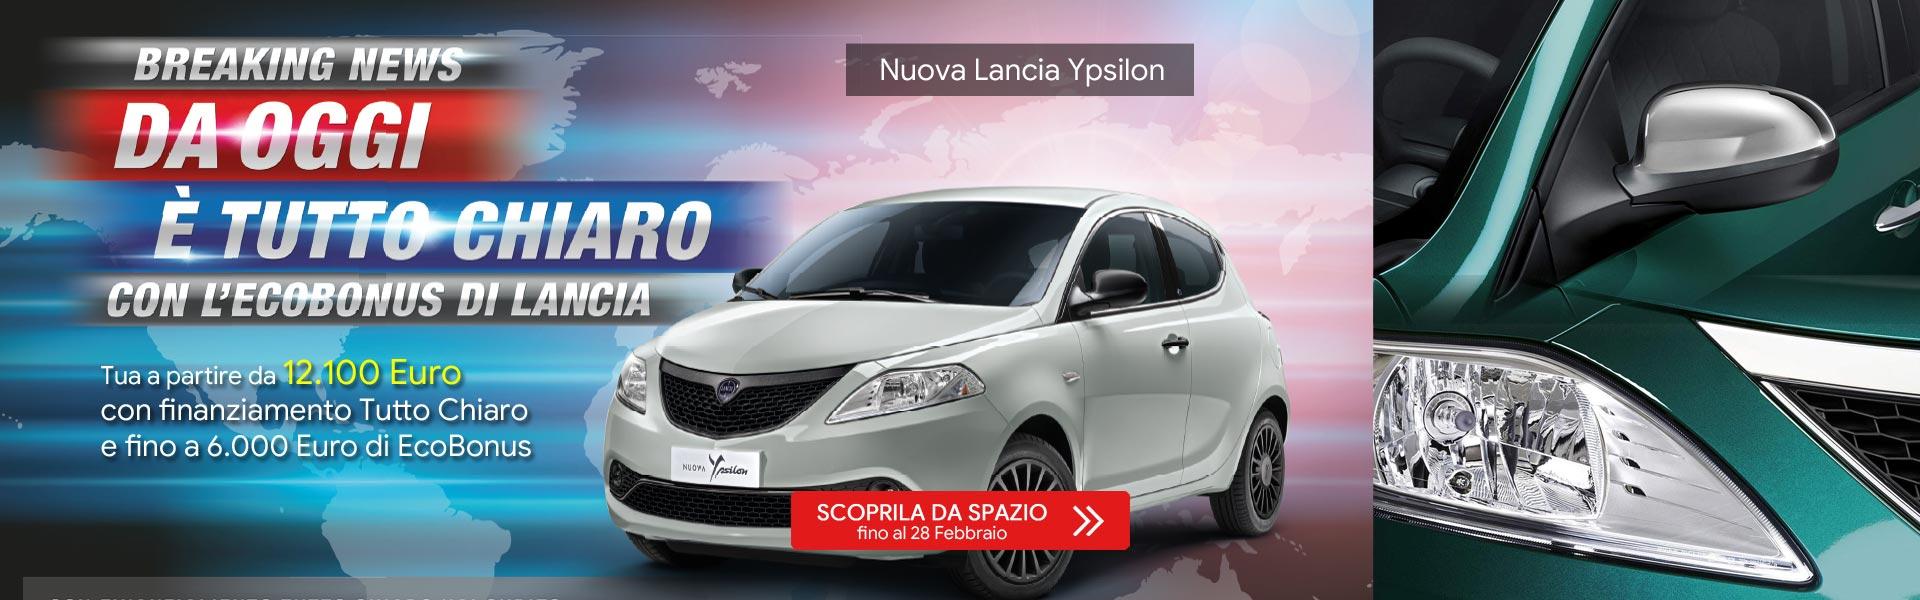 Lancia Ypsilon Platinum